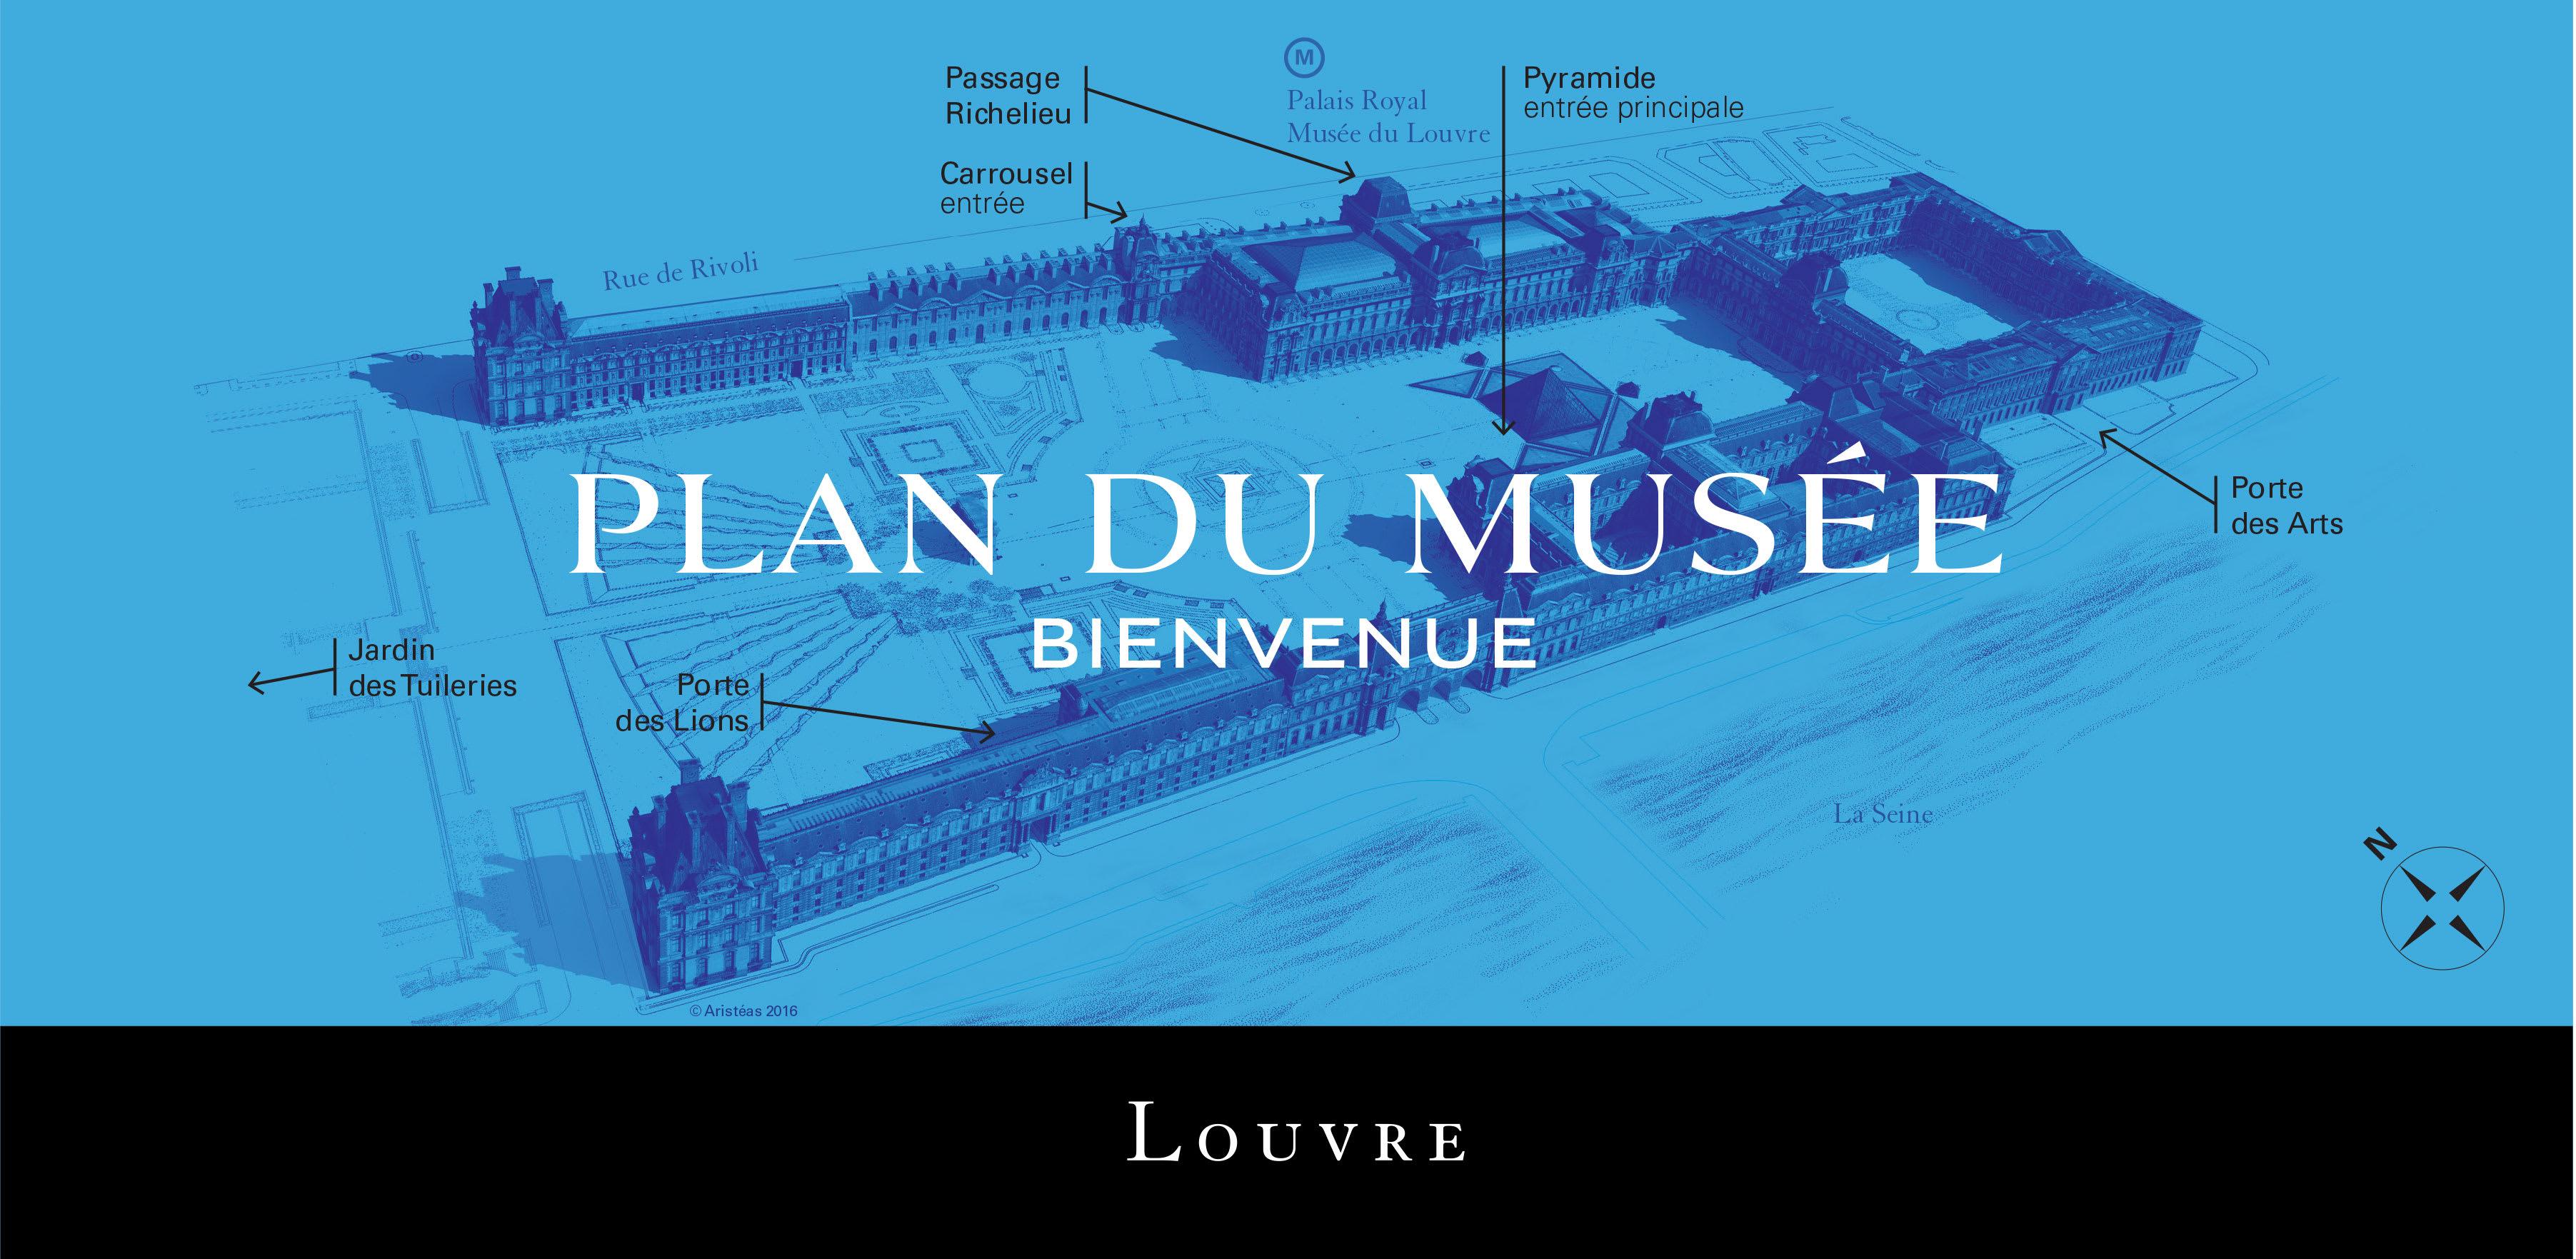 5 Tips To Visit The Louvre Visitparisregion